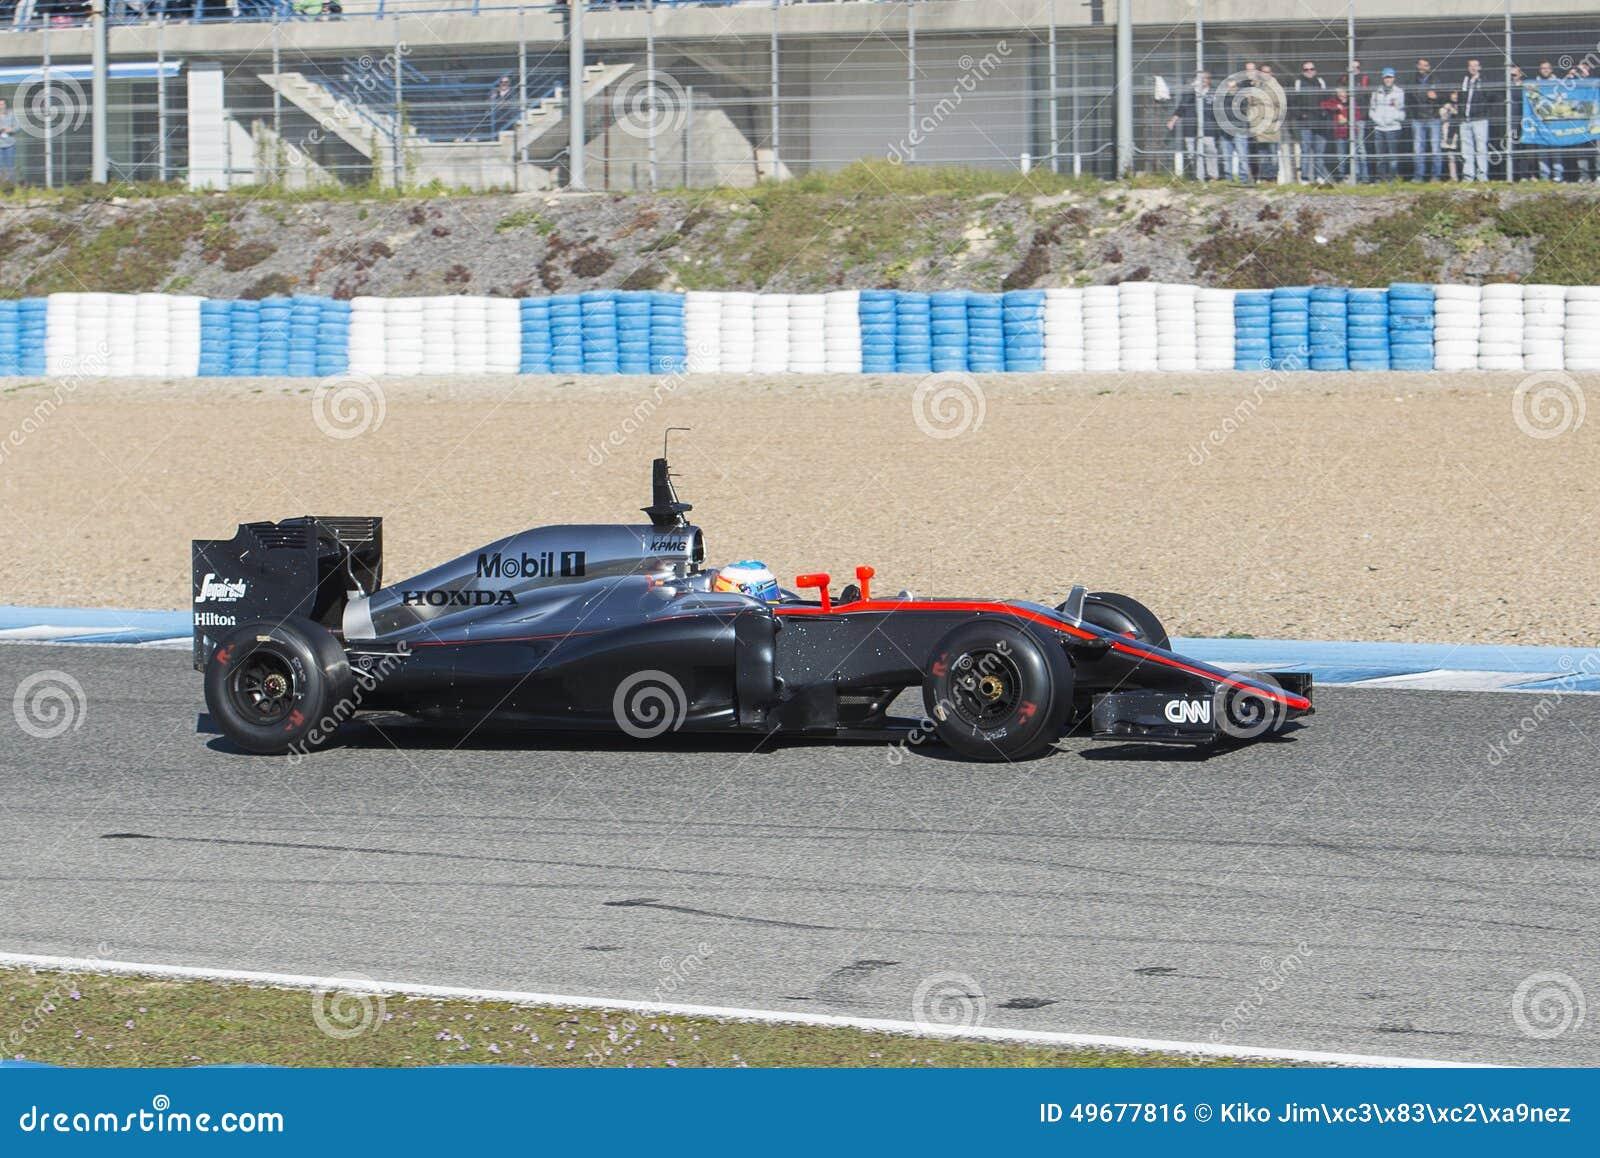 Circuito Fernando Alonso : Formula 1 2015: fernando alonso mclaren honda editorial photo